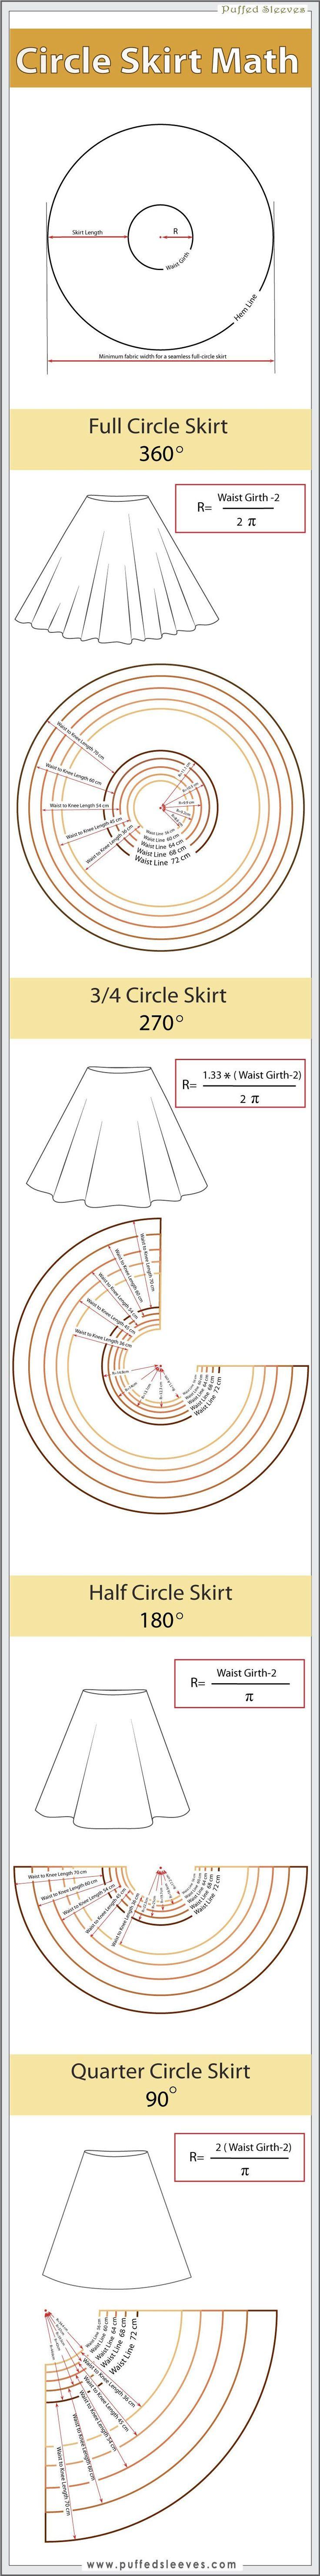 Circle skirt pattern basics